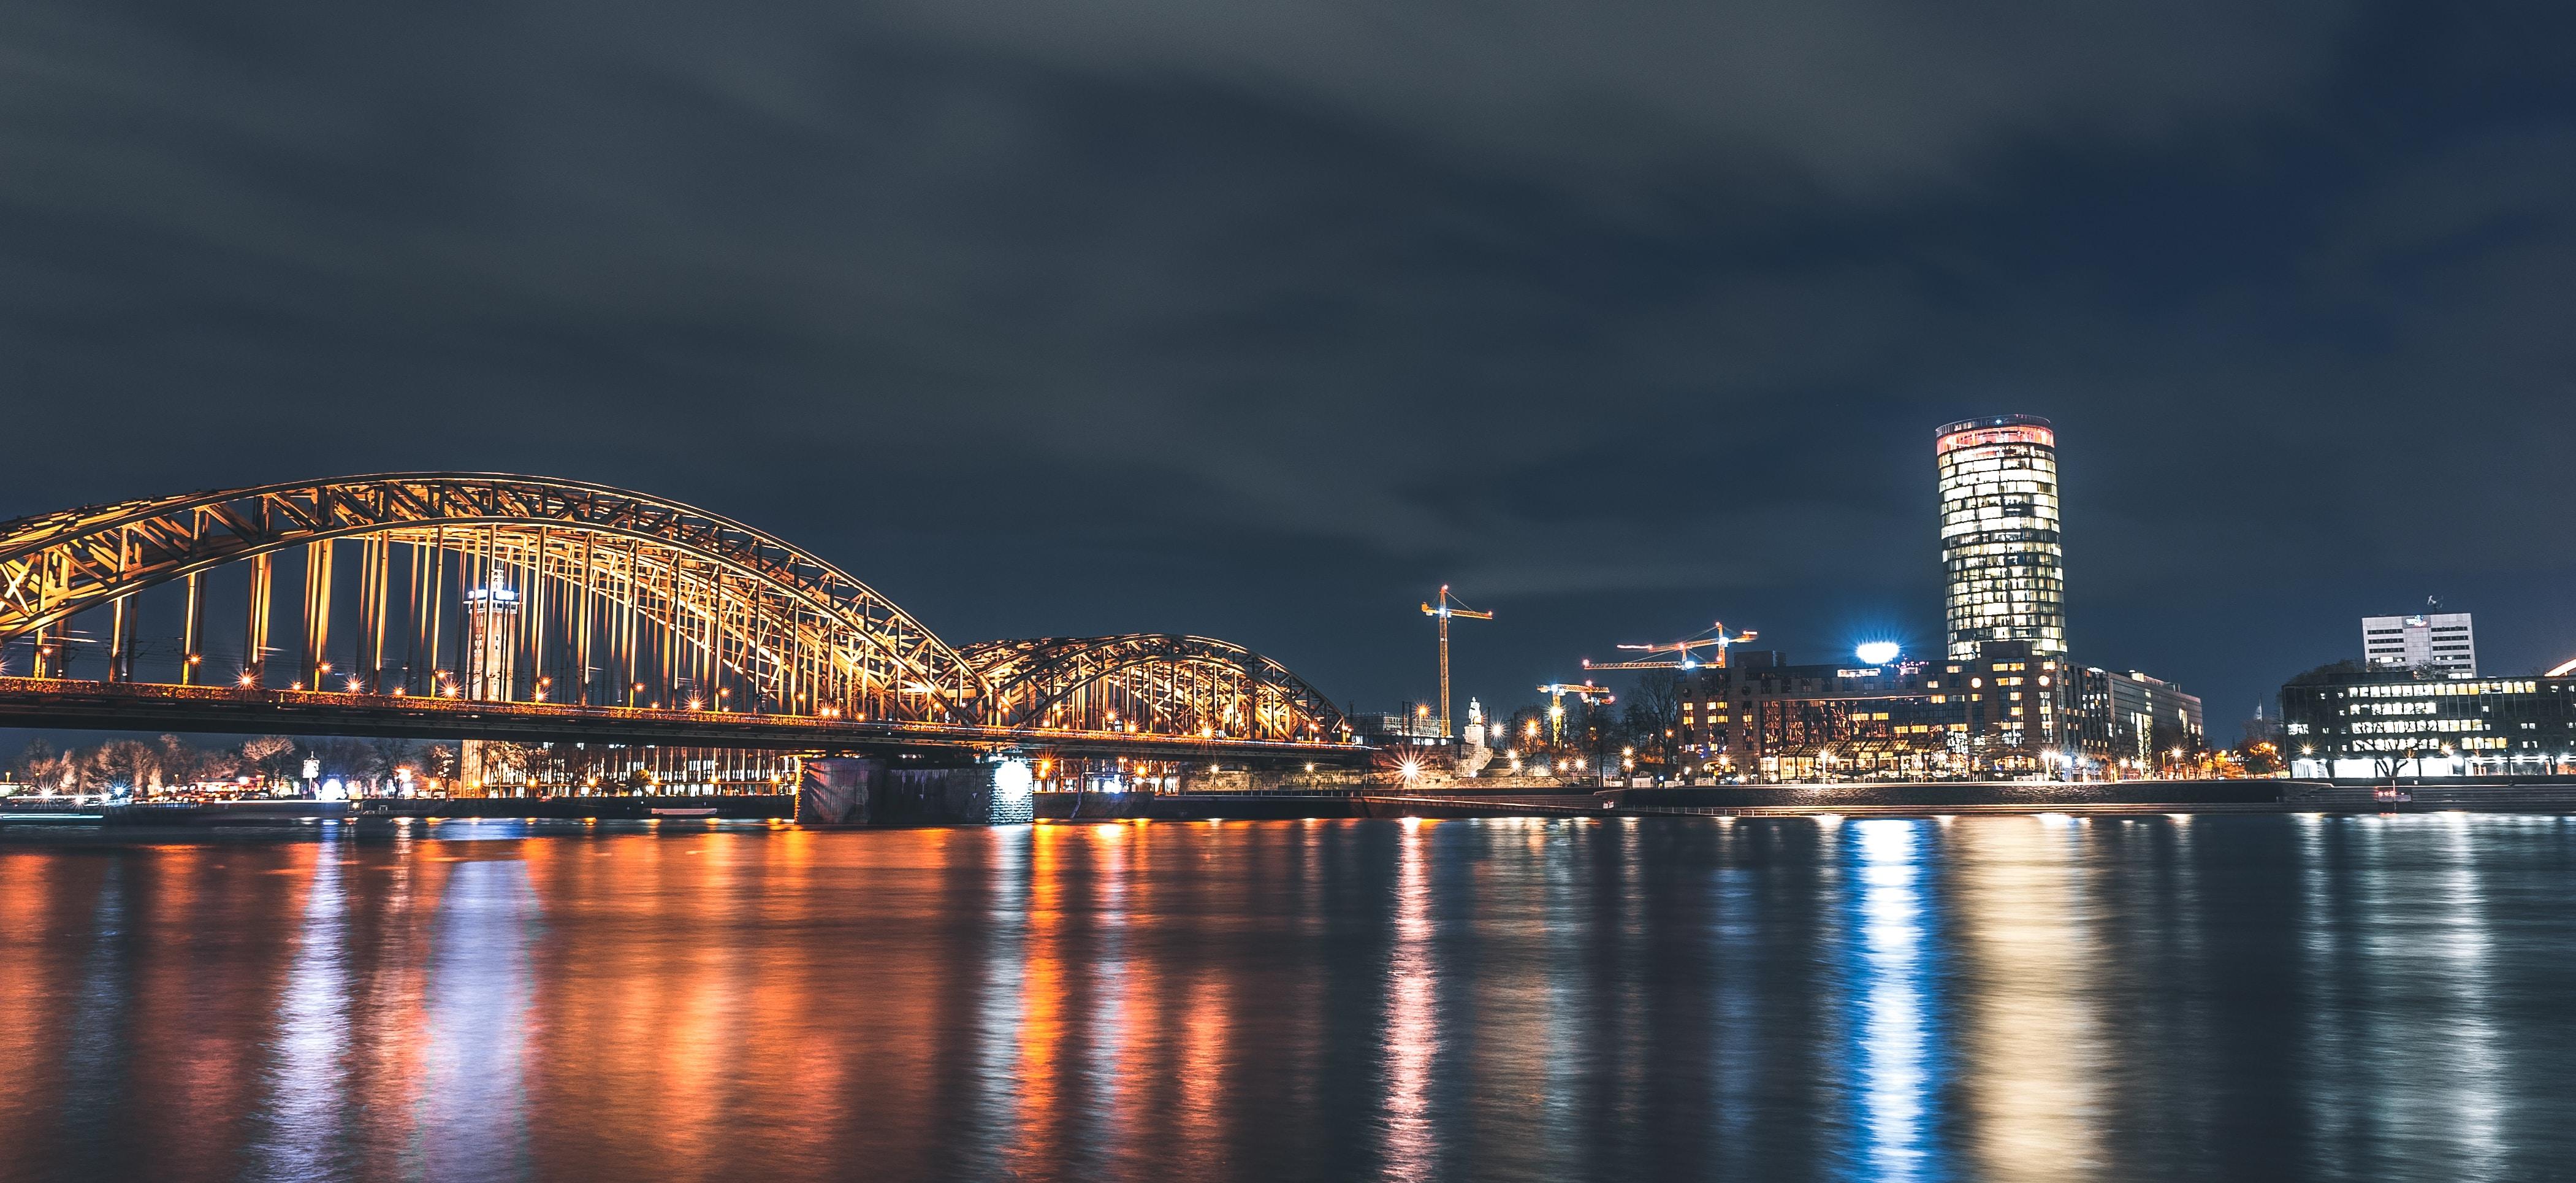 panorama photo t of city during night